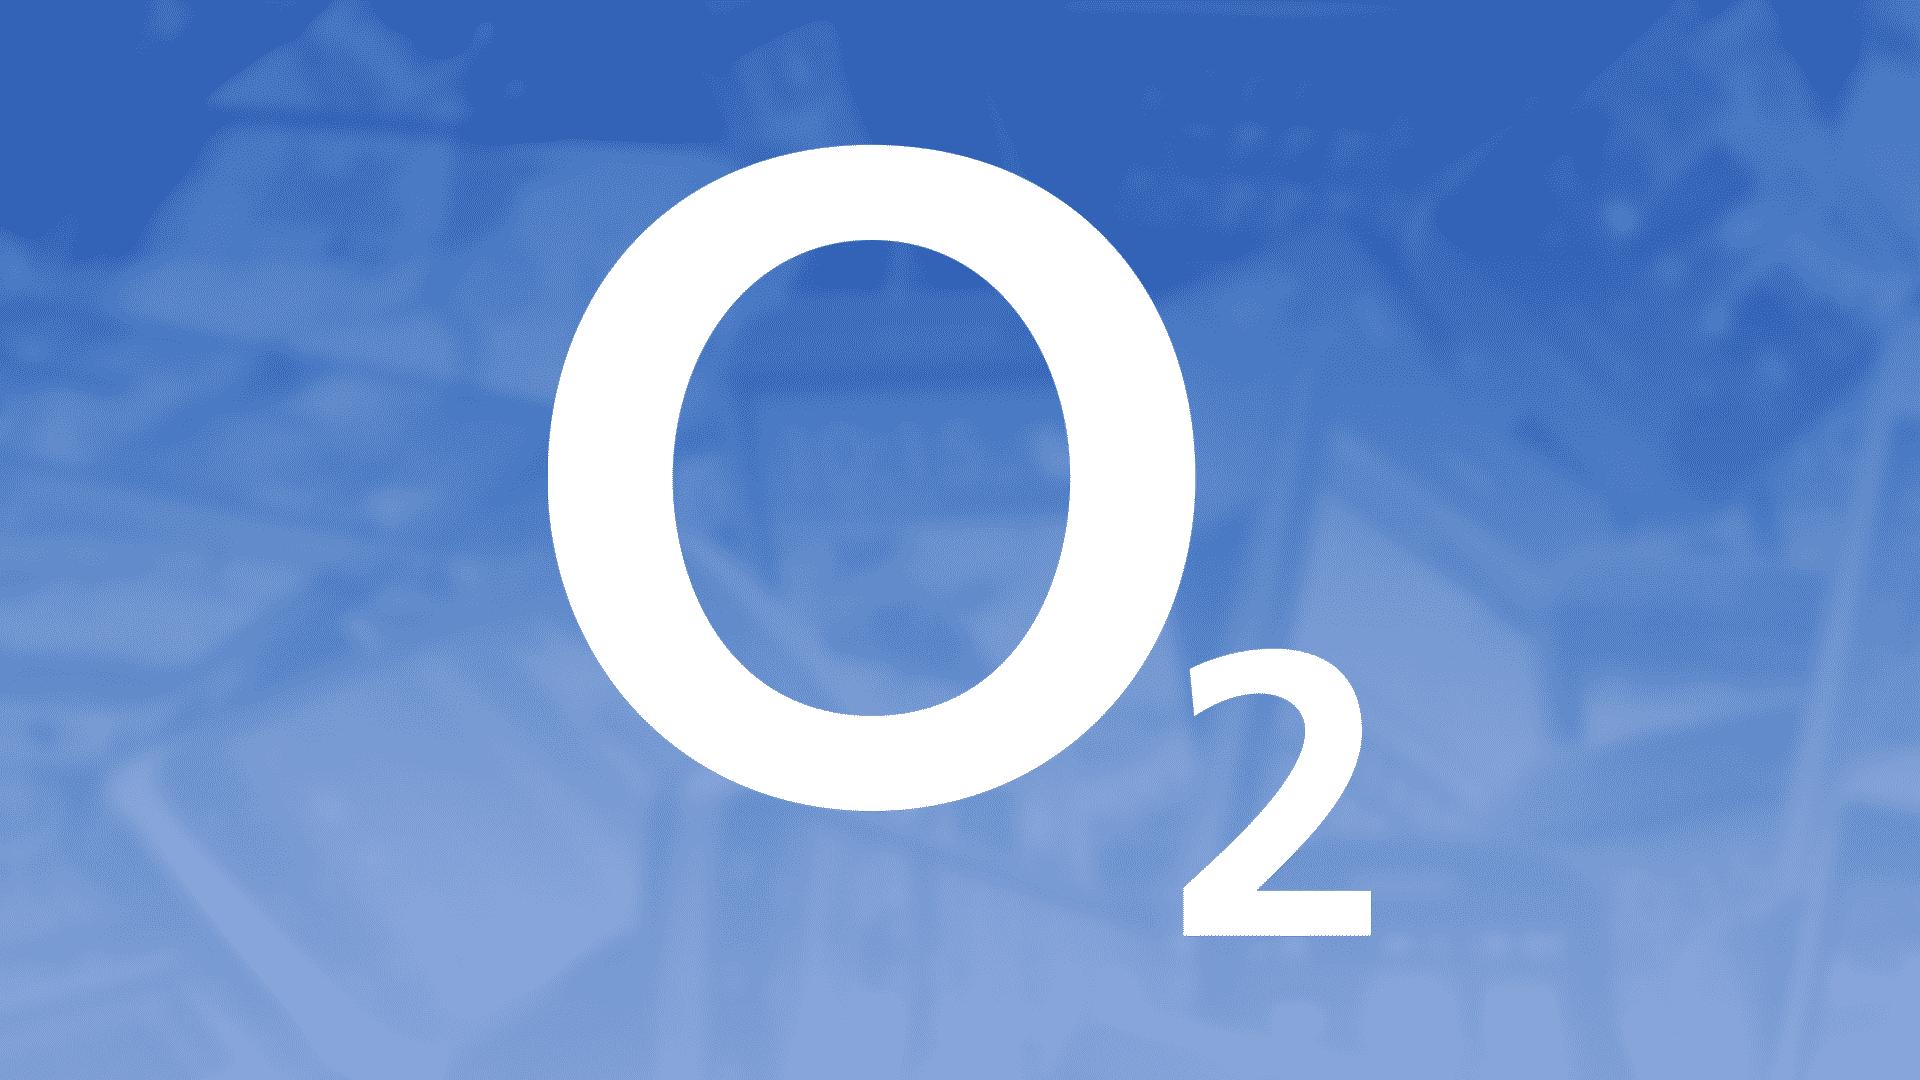 mobilný operátor o2 logo